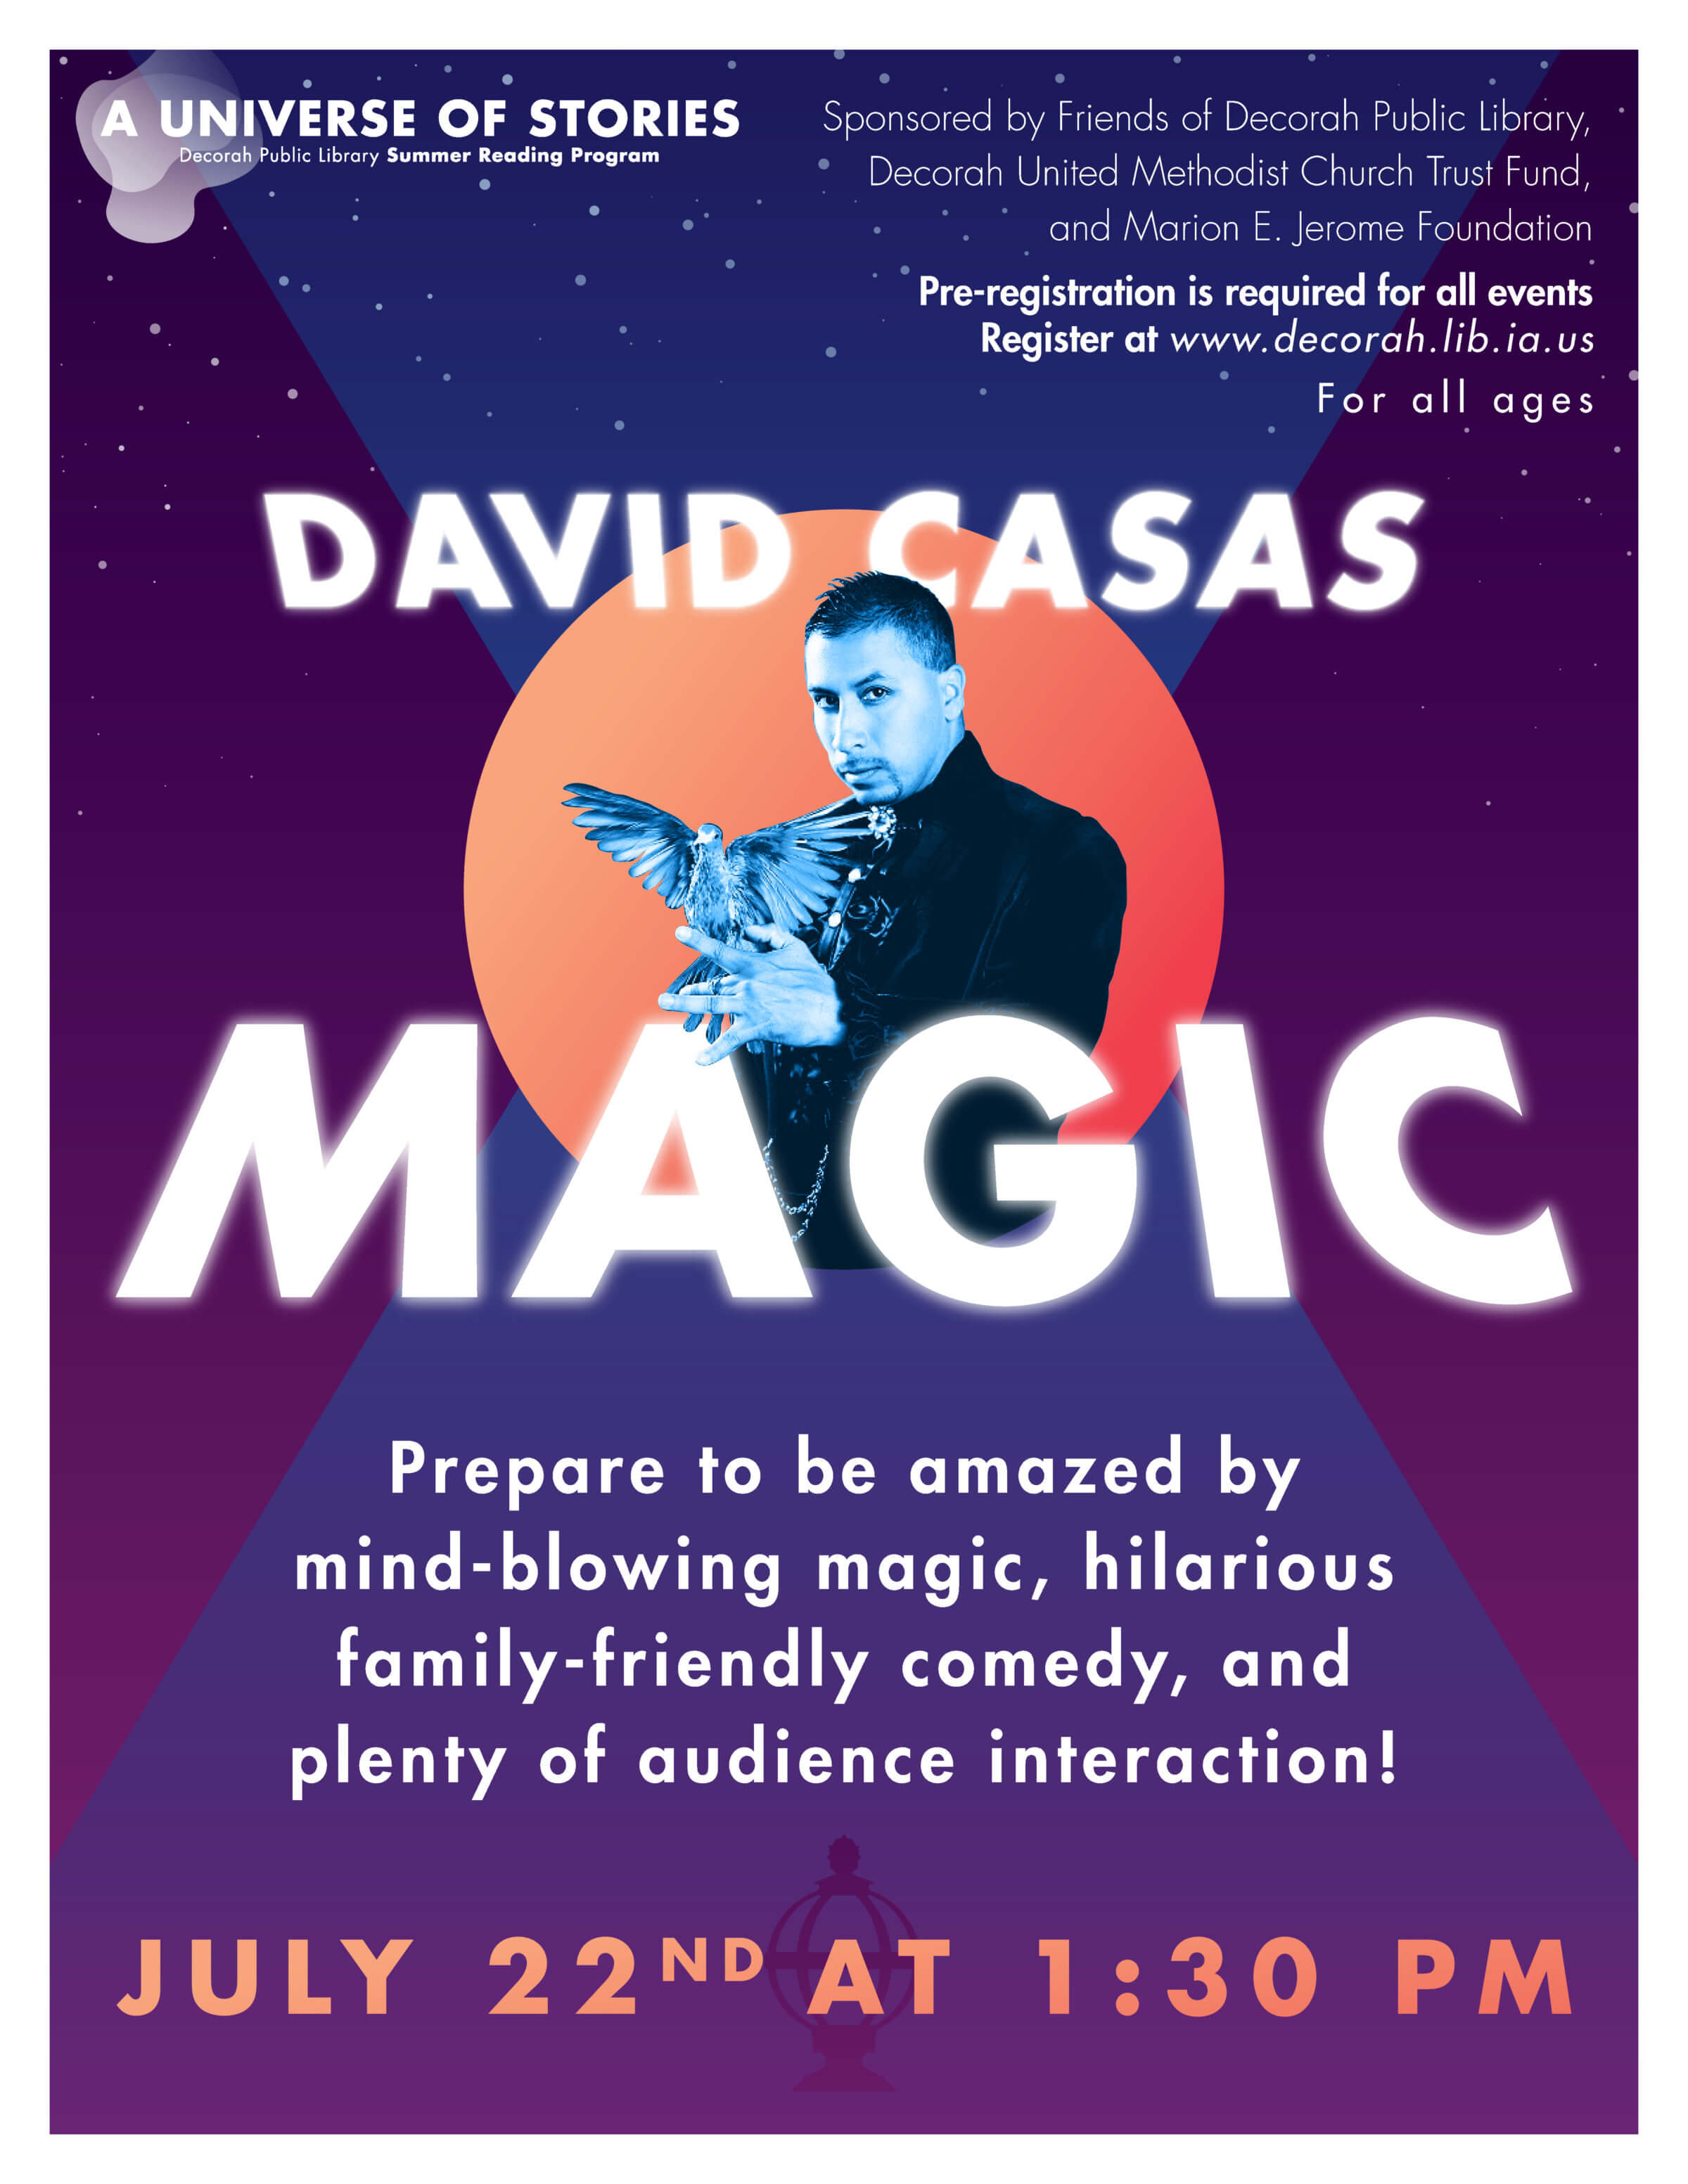 David Casas Magic